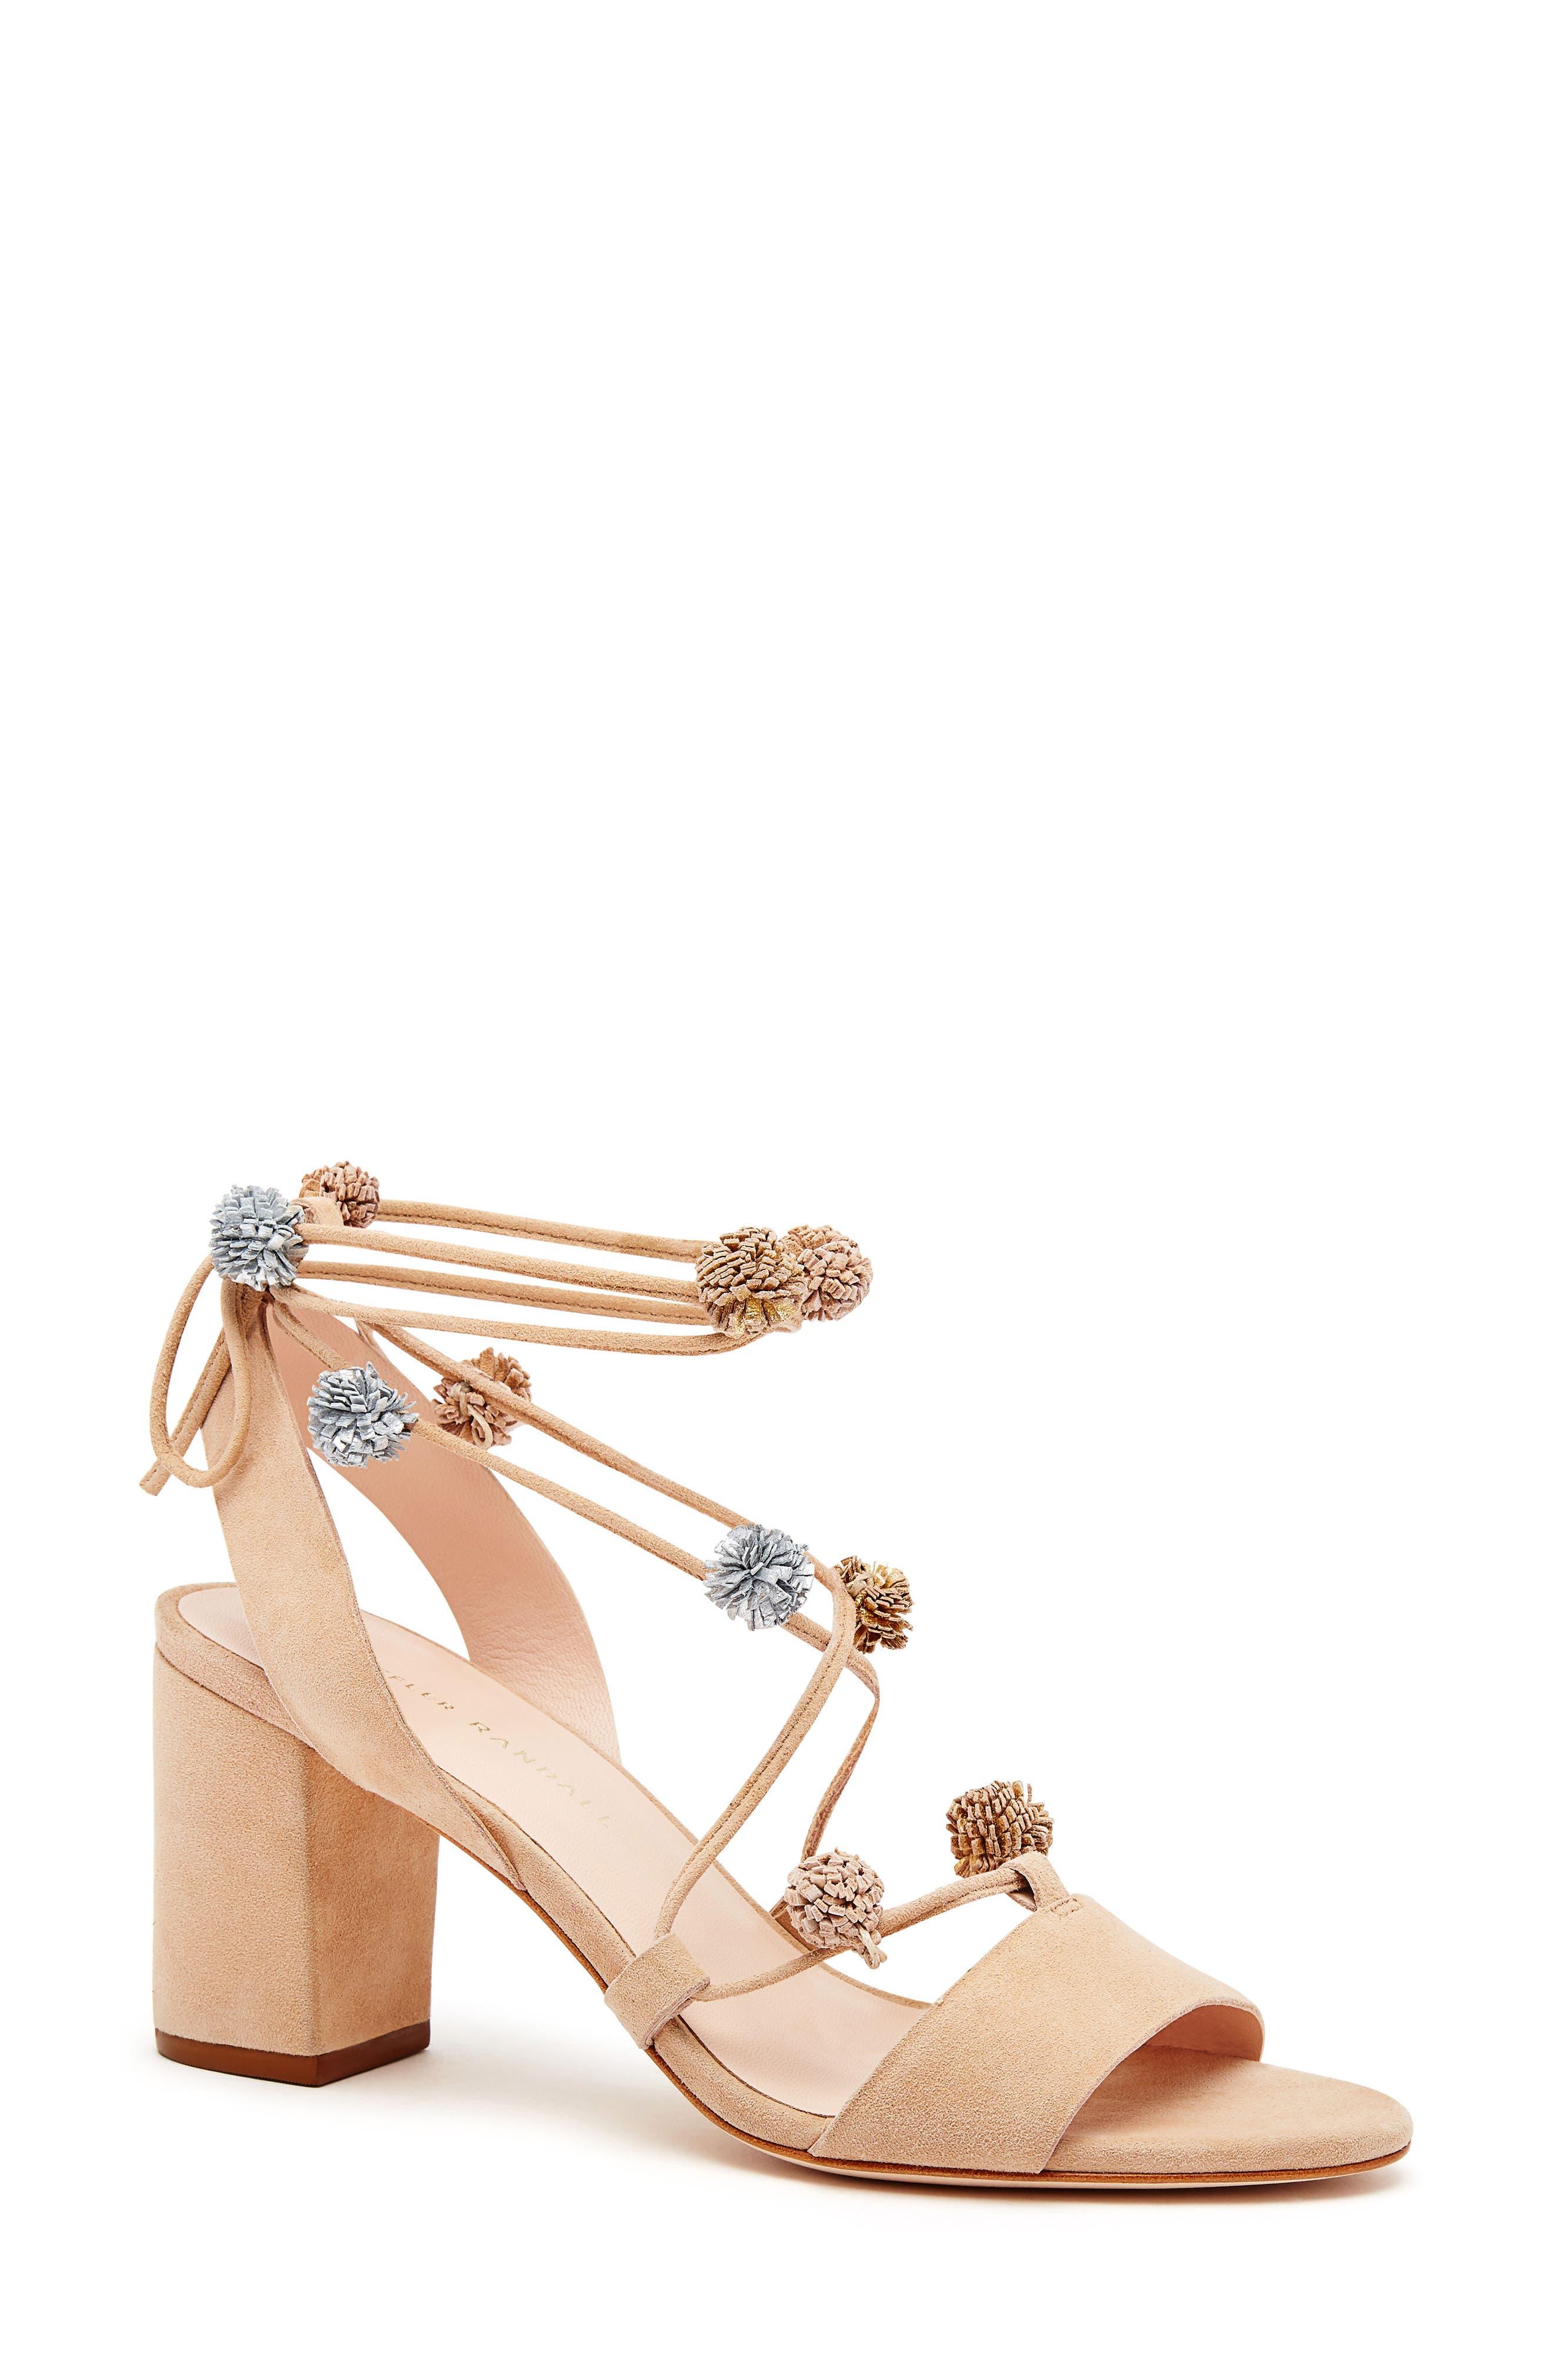 Loeffler Randall Bea Pompom Lace-Up Sandal (Women)